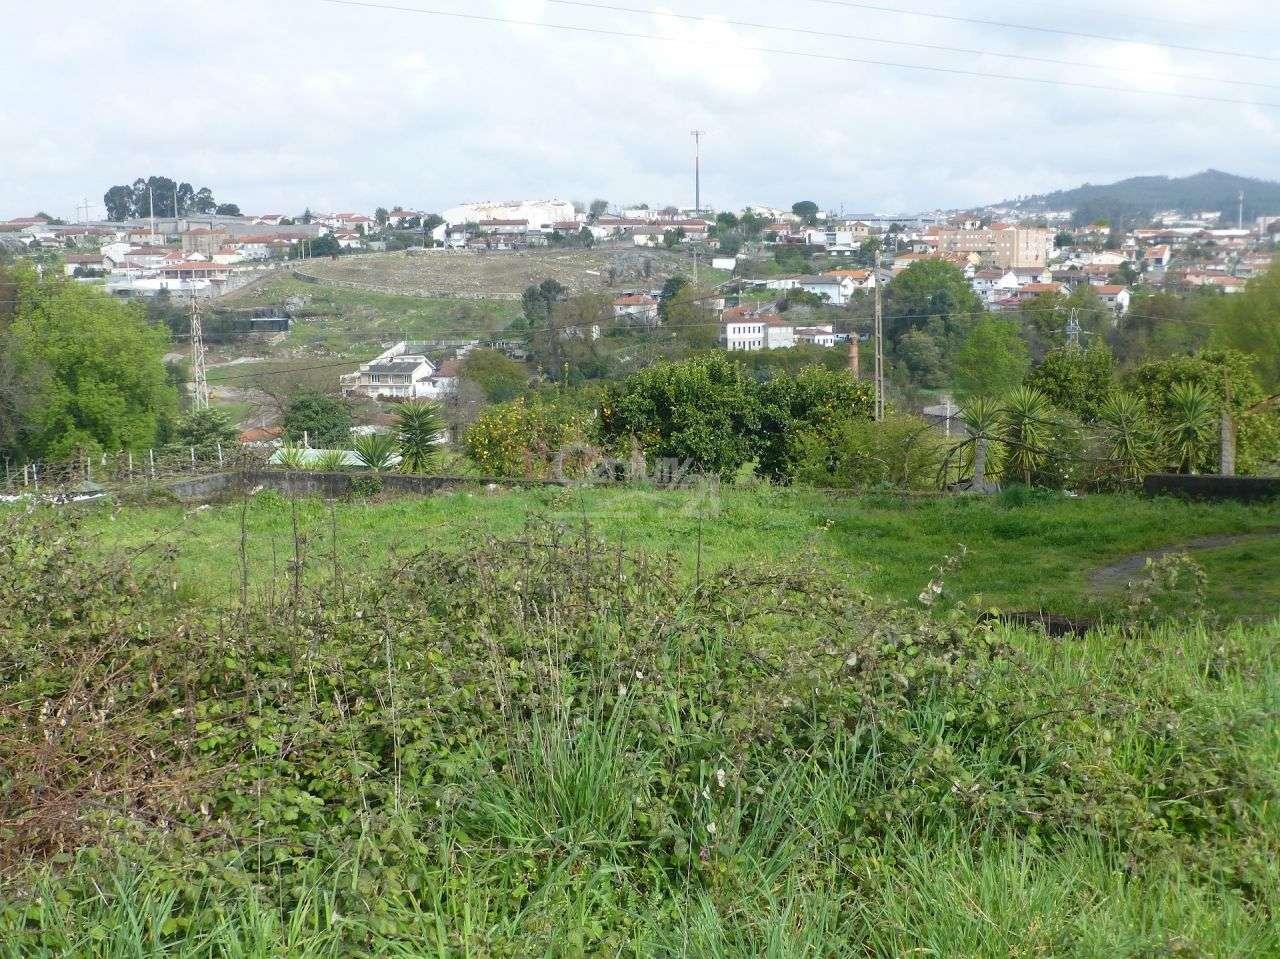 Terreno para comprar, Castêlo da Maia, Porto - Foto 10